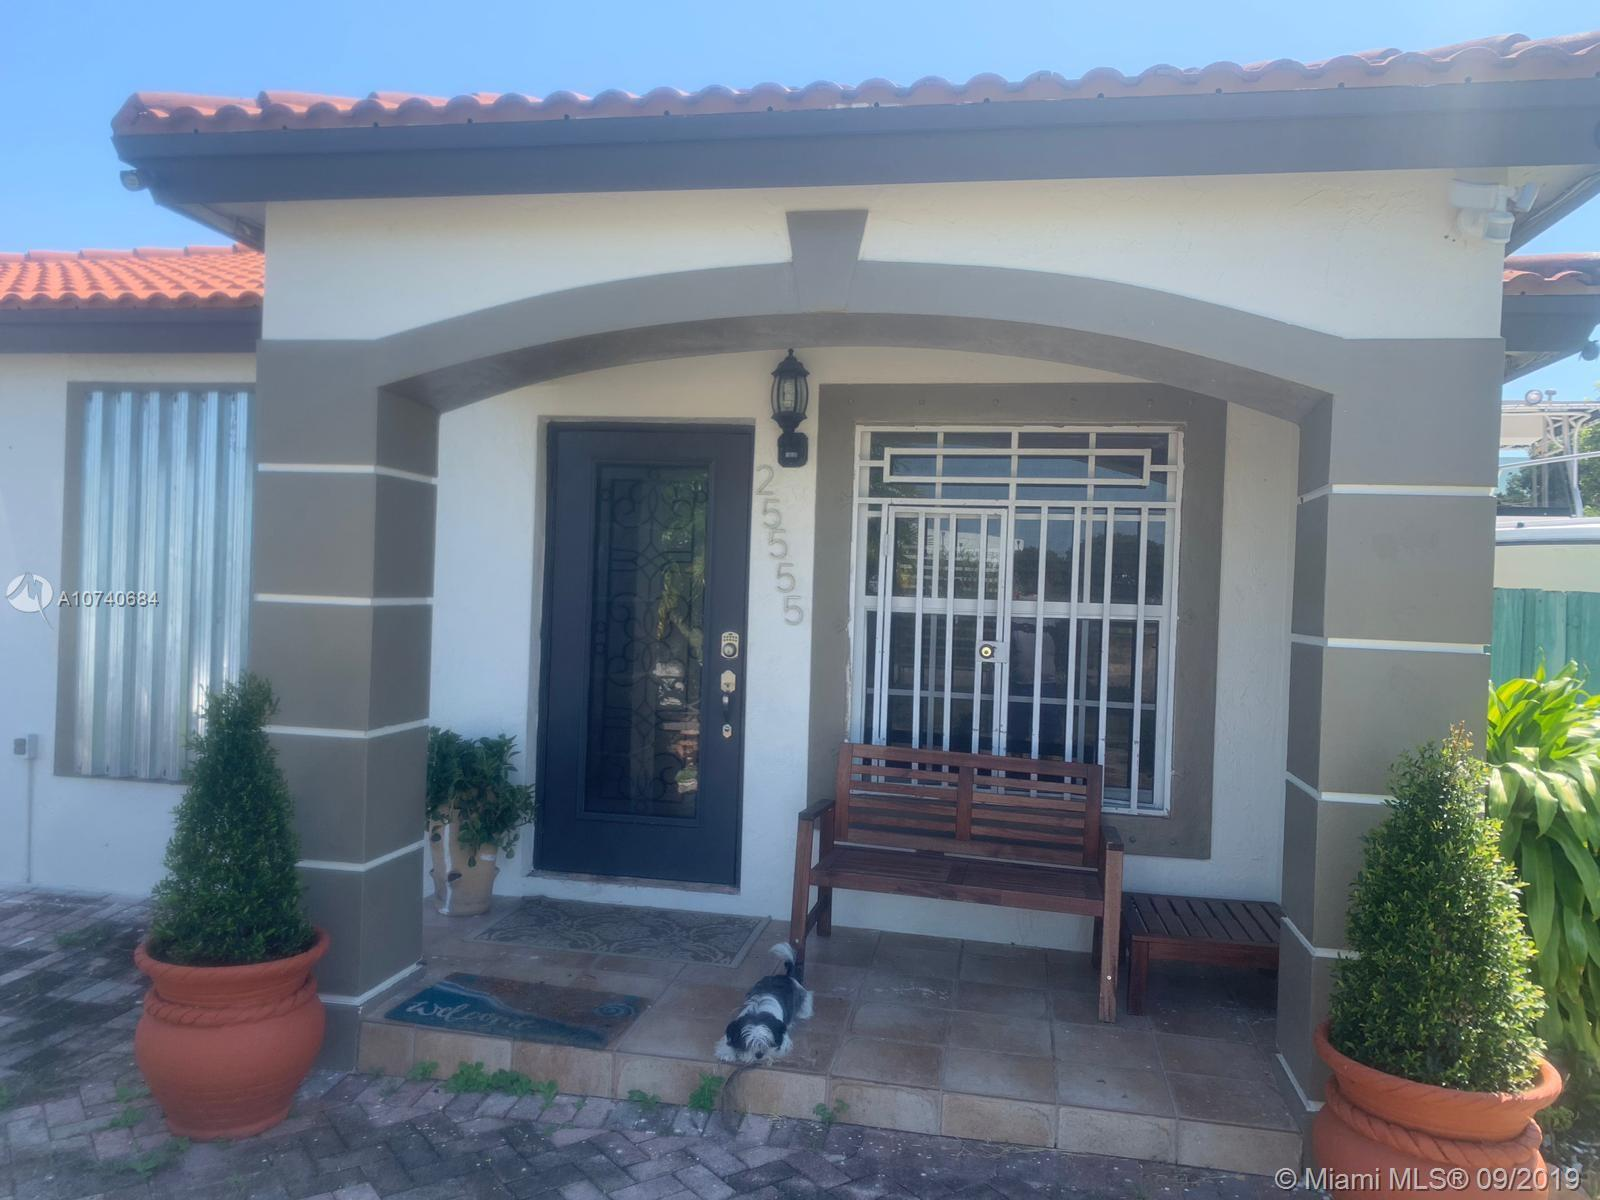 25555 SW 139 Ave, Homestead, FL 33032 - Homestead, FL real estate listing